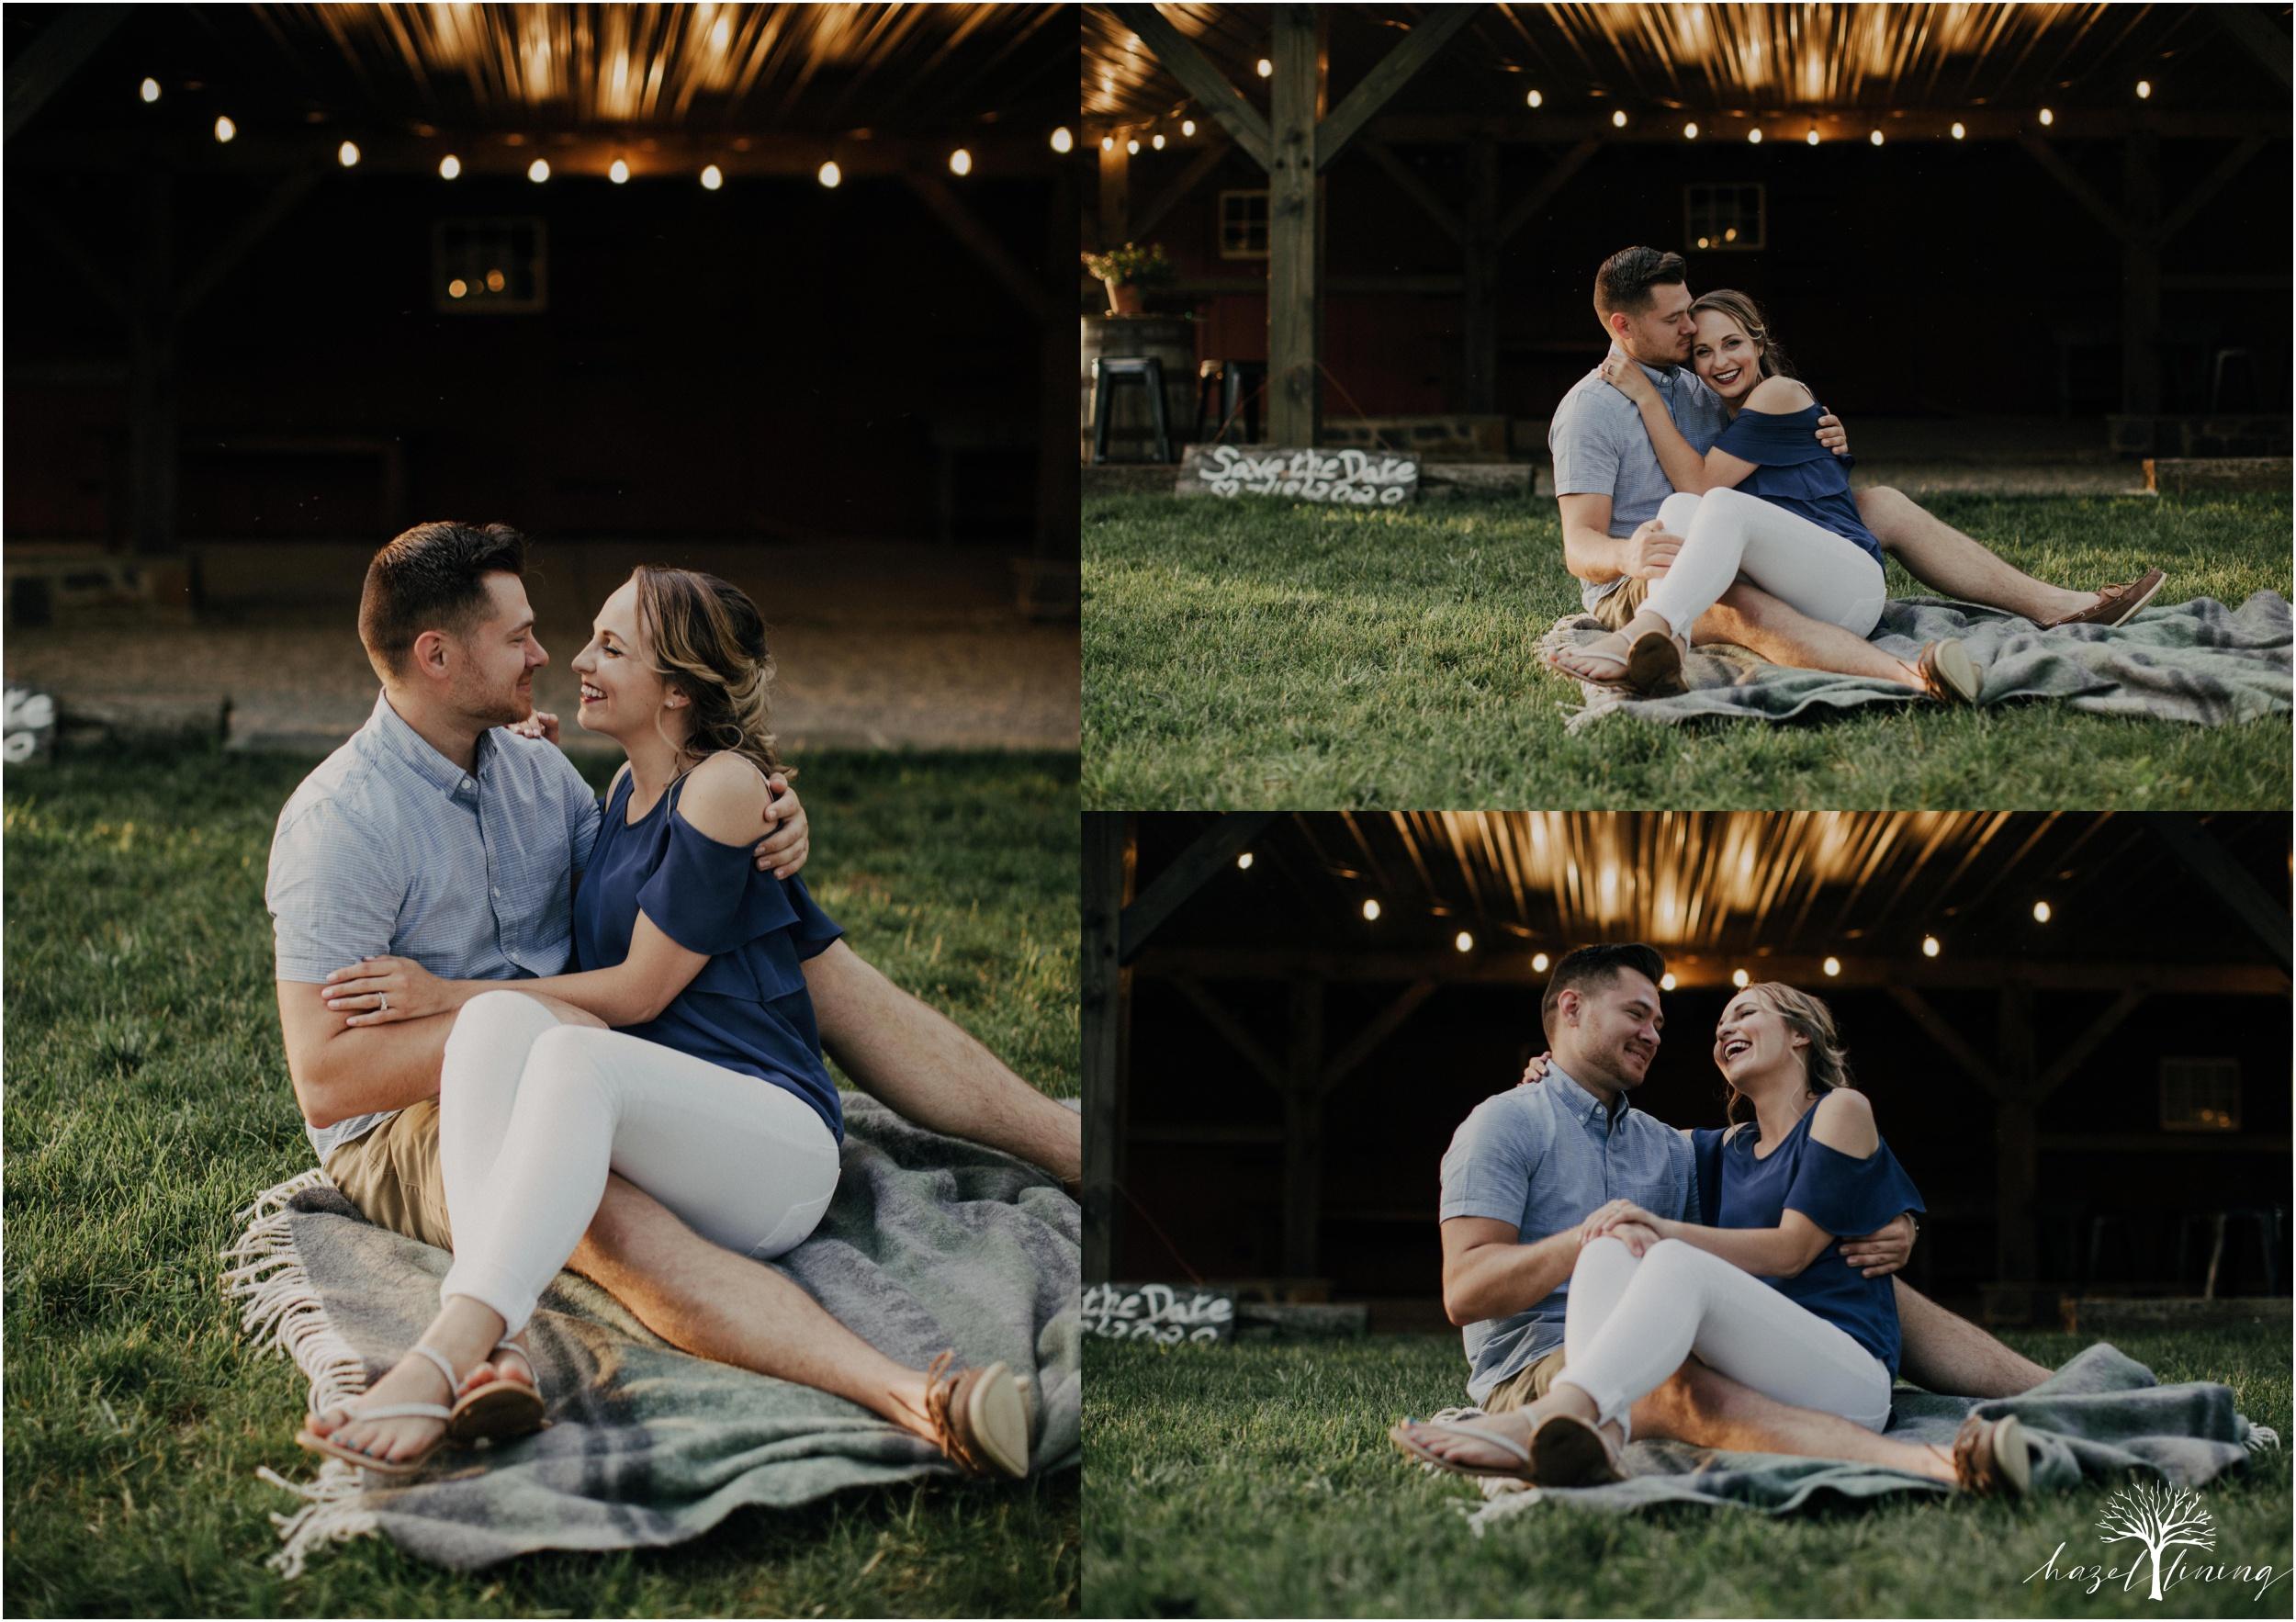 rachel-warner-chris-niedrist-the-farm-bakery-and-events-quakertown-pa-summer-engagement-hazel-lining-photography-destination-elopement-wedding-engagement-photography_0064.jpg